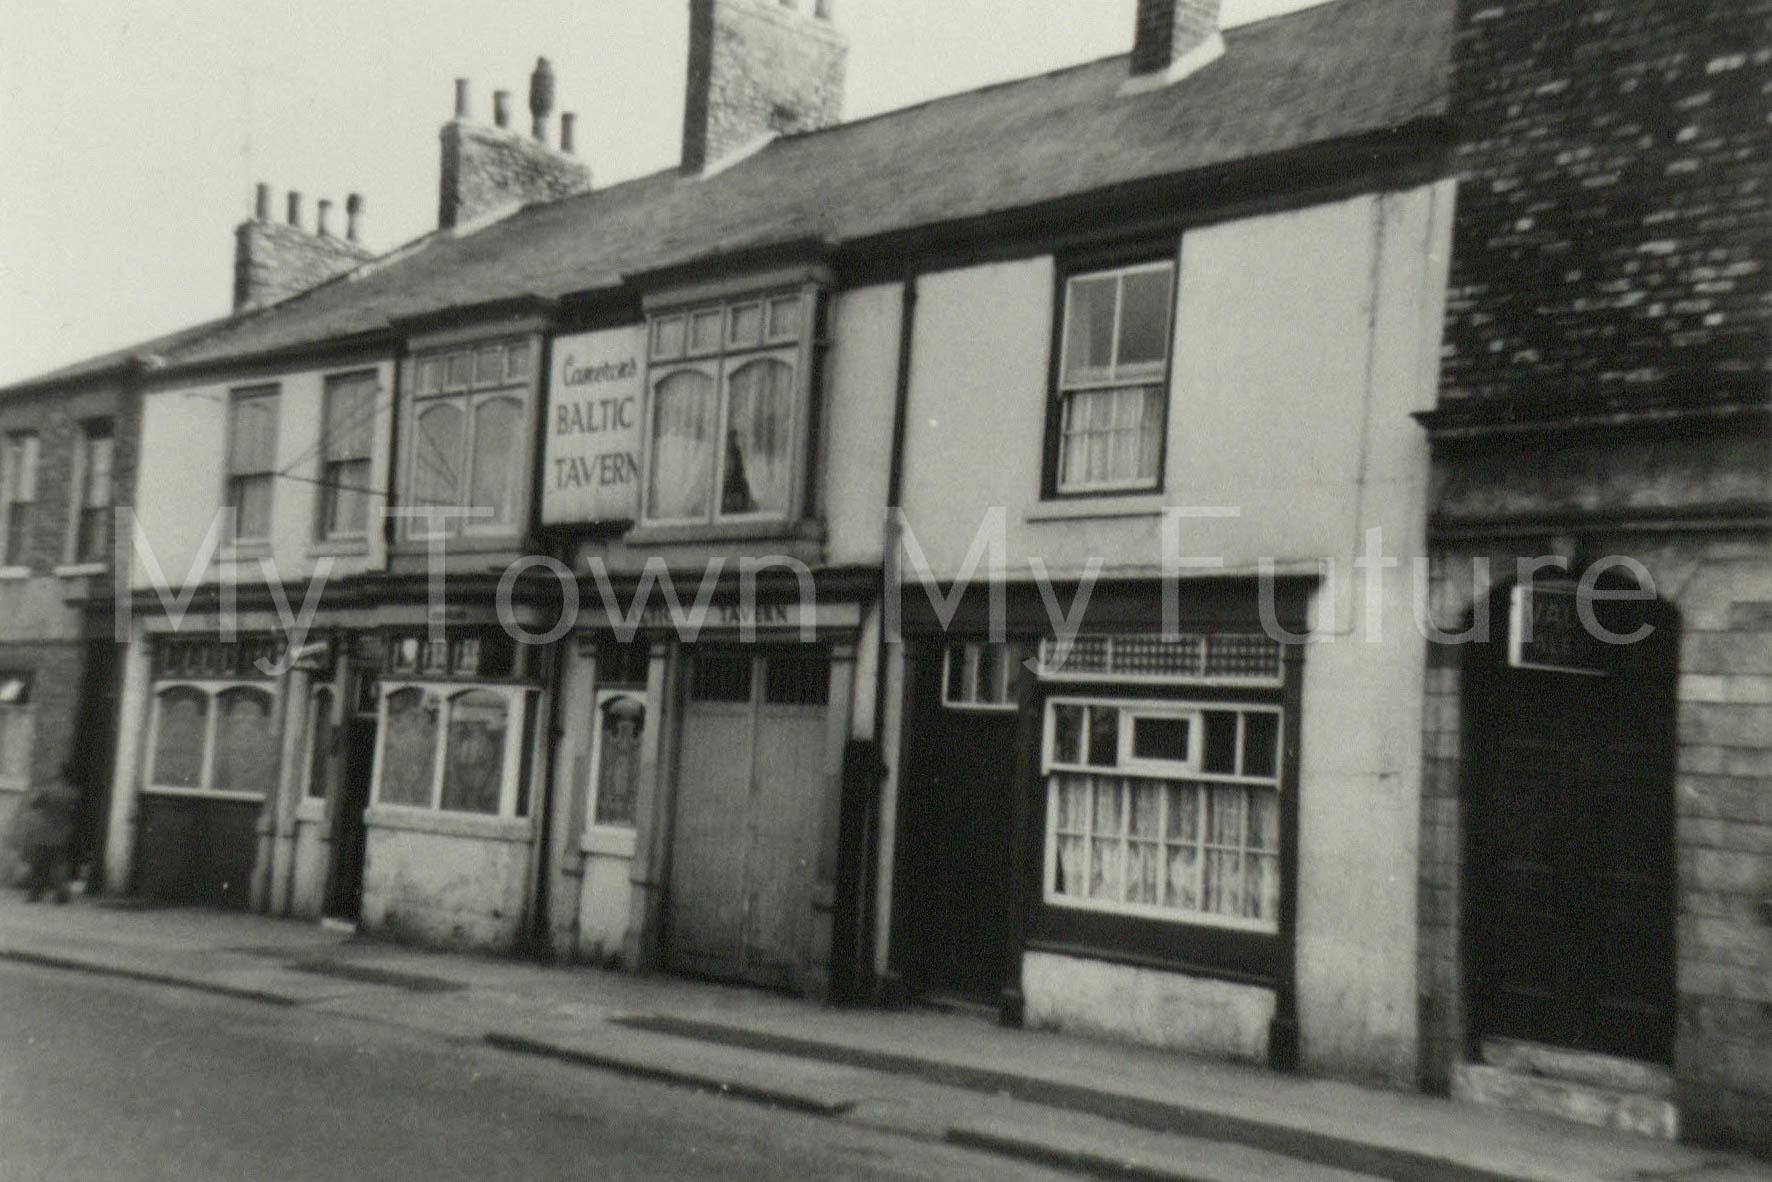 Baltic Tavern - Commercial Street - St Hilda's - Next door to Robin Hood, 1960, Paul Stephenson